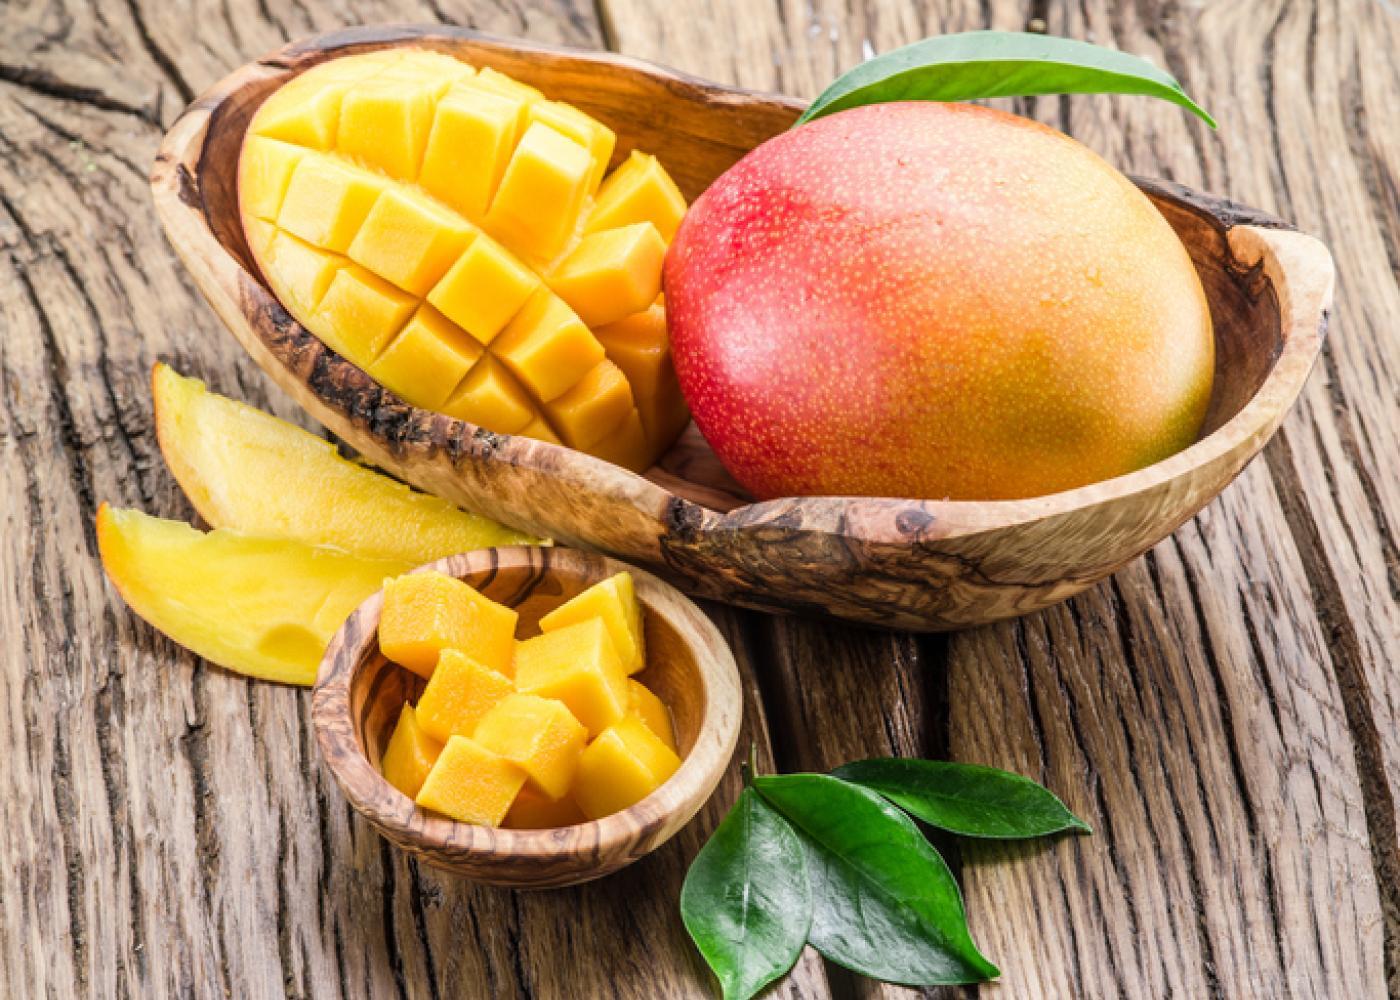 Mango: description, use. Nutritional value and calorie content of mango 57